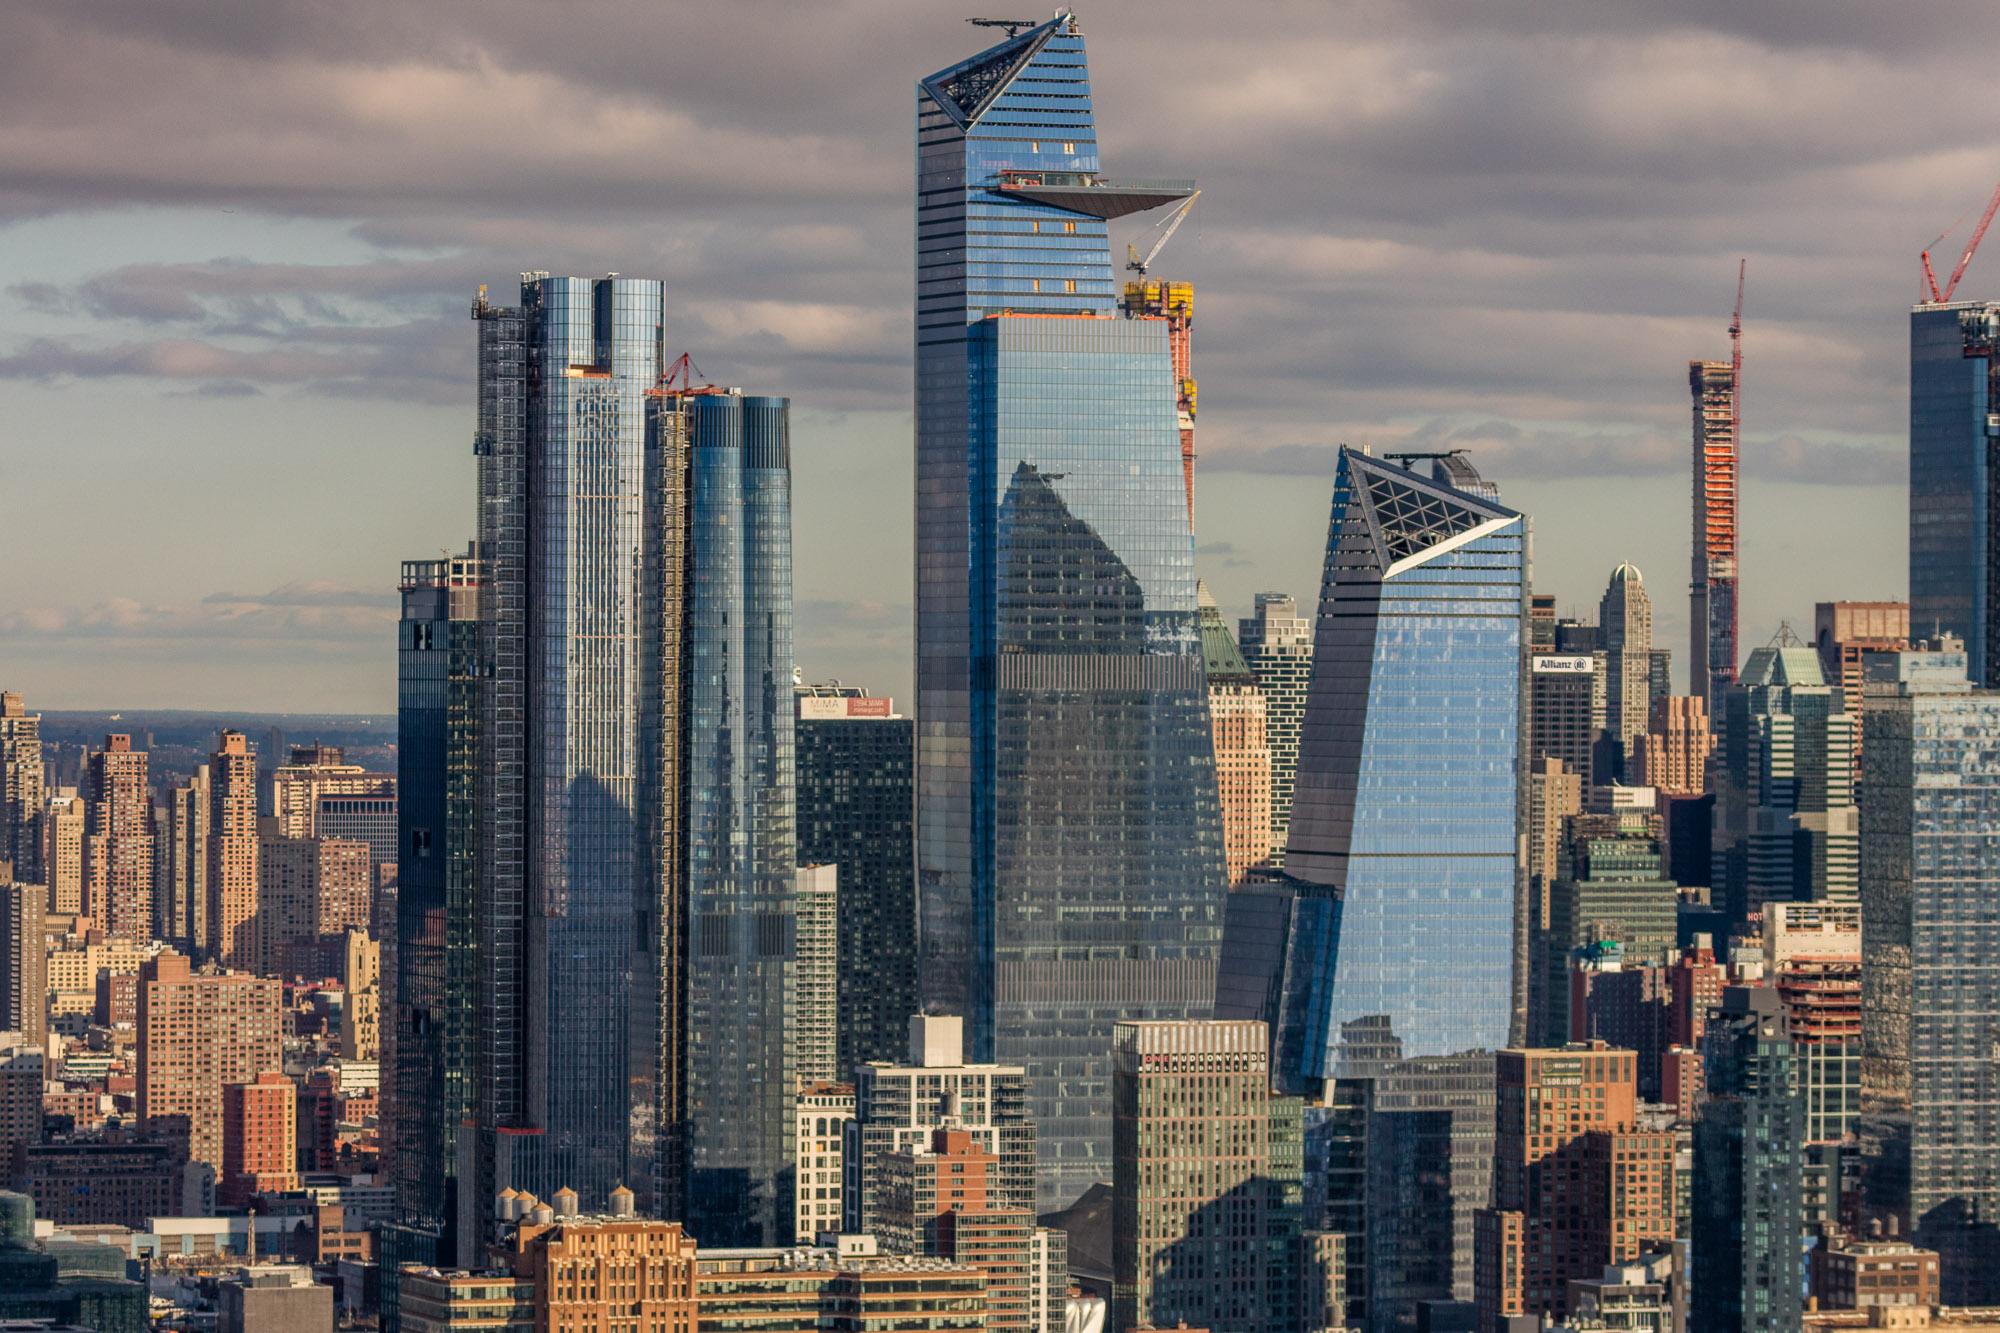 Tech firms lease major Manhattan real estate in 2019